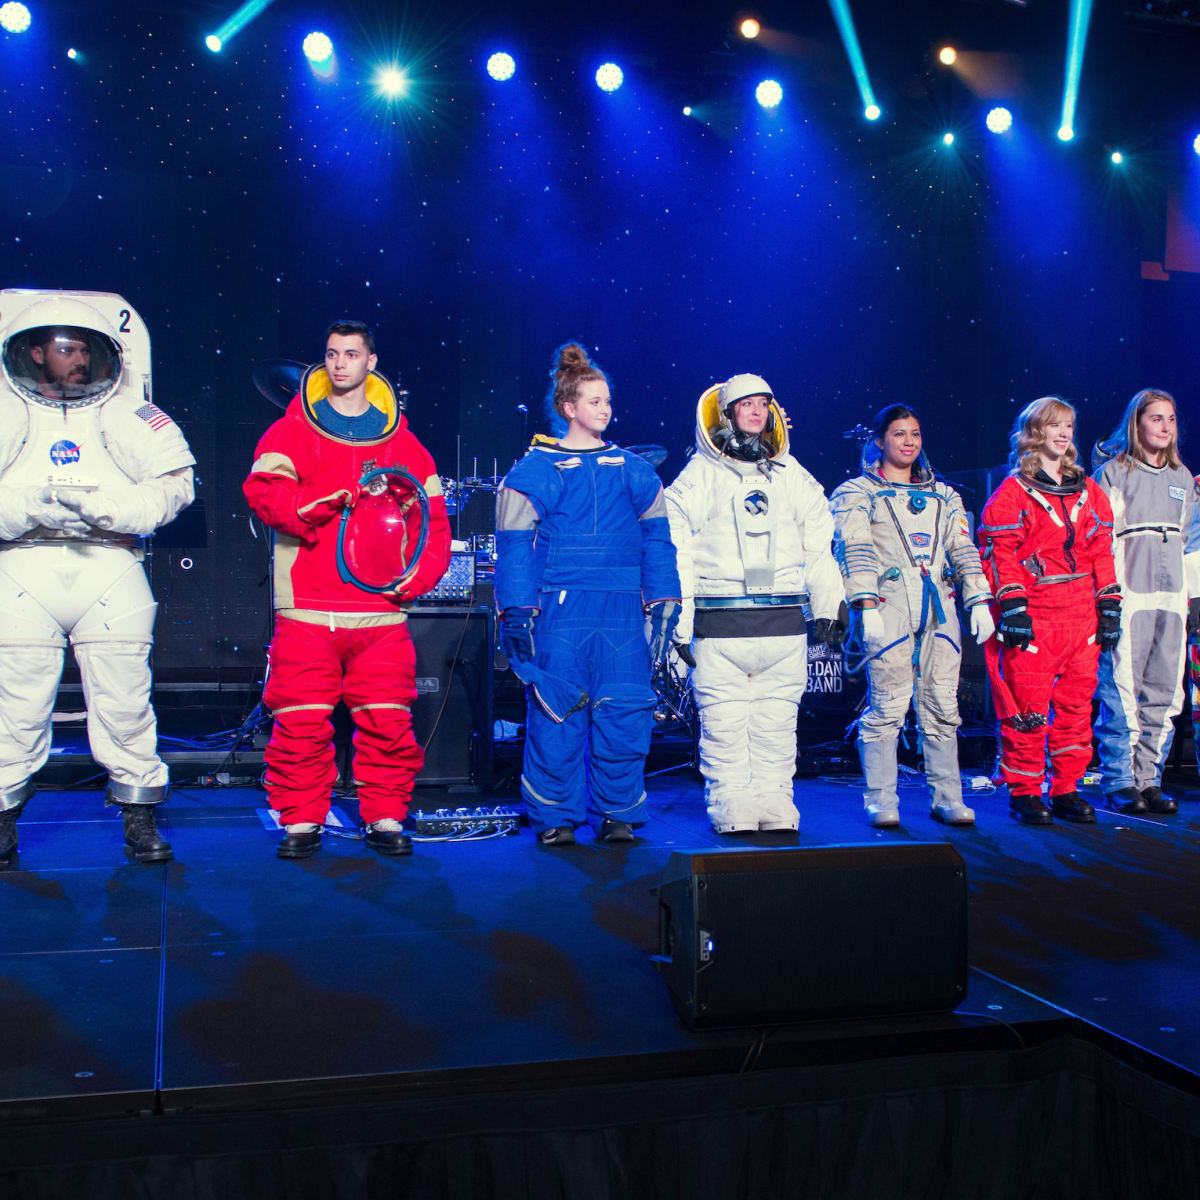 Houston, Space Center Houston Galaxy Gala, April 2017, spacesuit collection fashion show